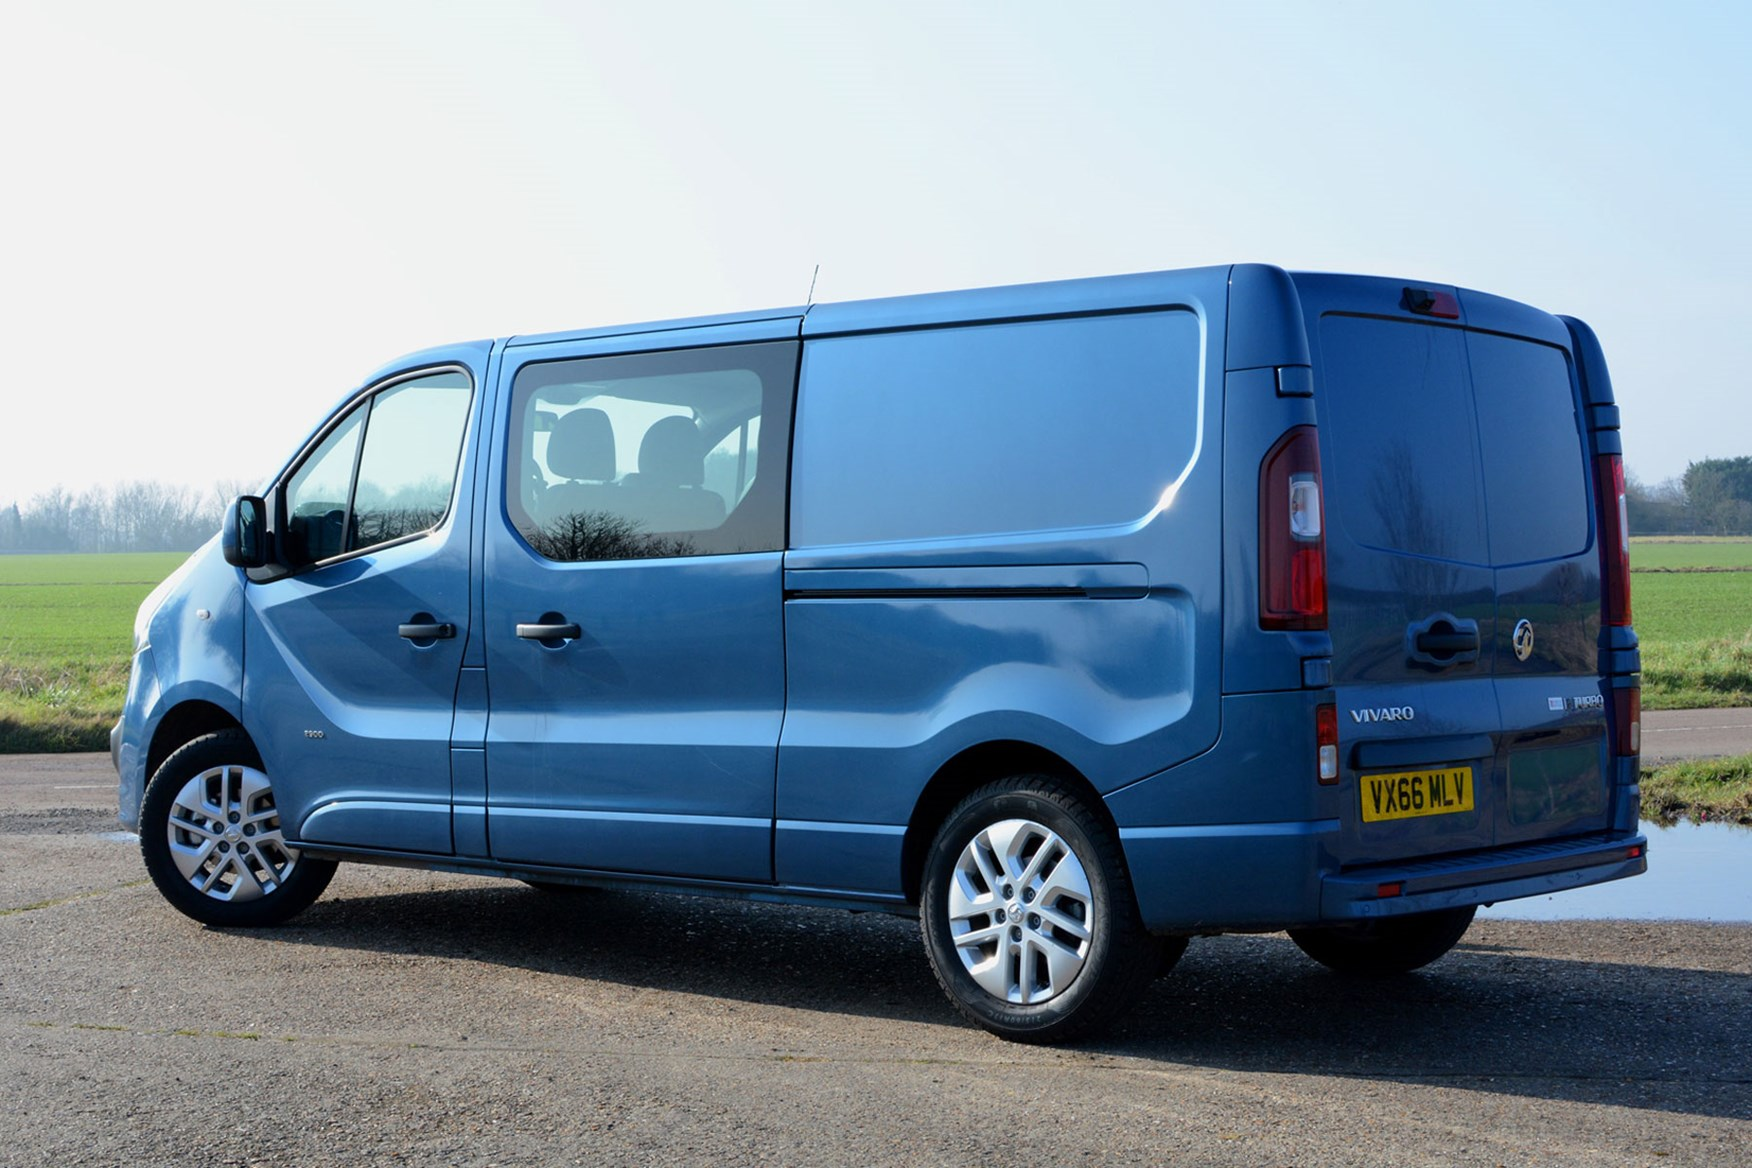 Vauxhall Vivaro Doublecab Sportive review - rear view, blue